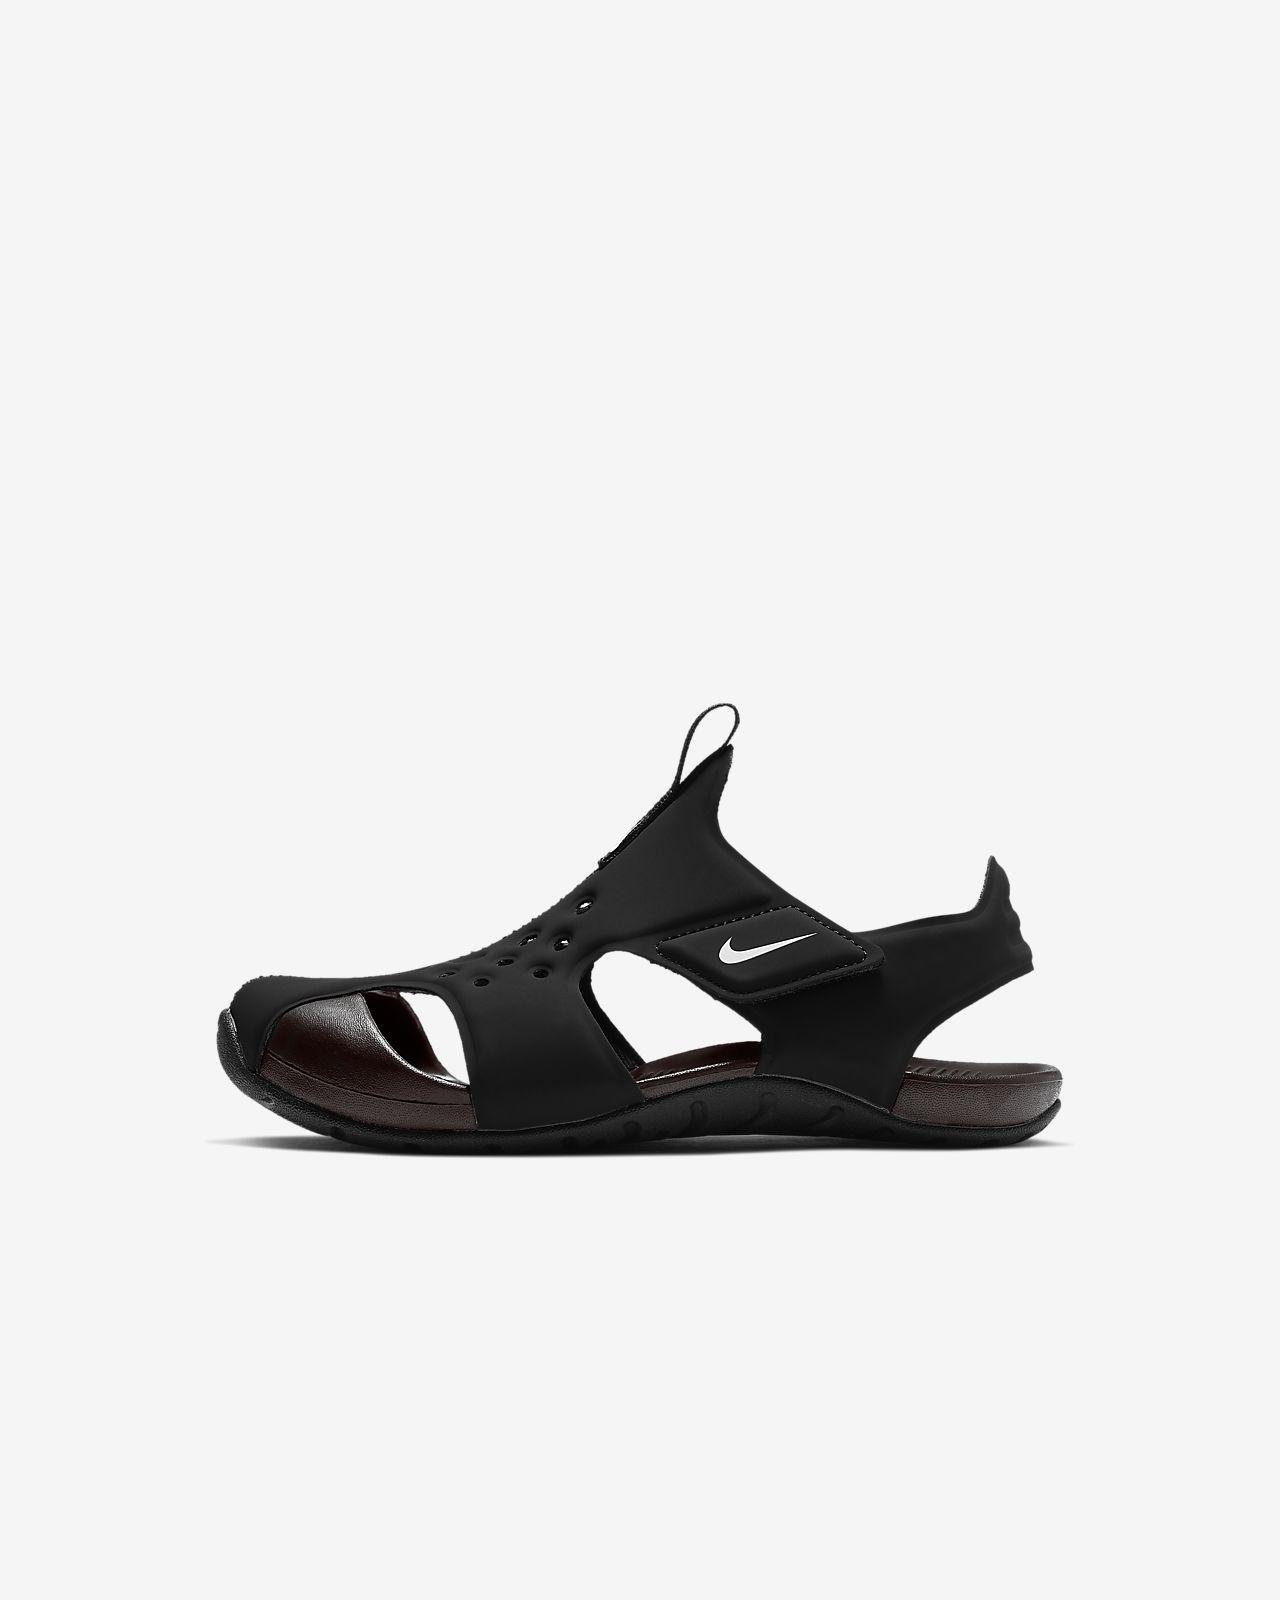 Nike Sunray Protect 2 Sandalias - Niño/a pequeño/a